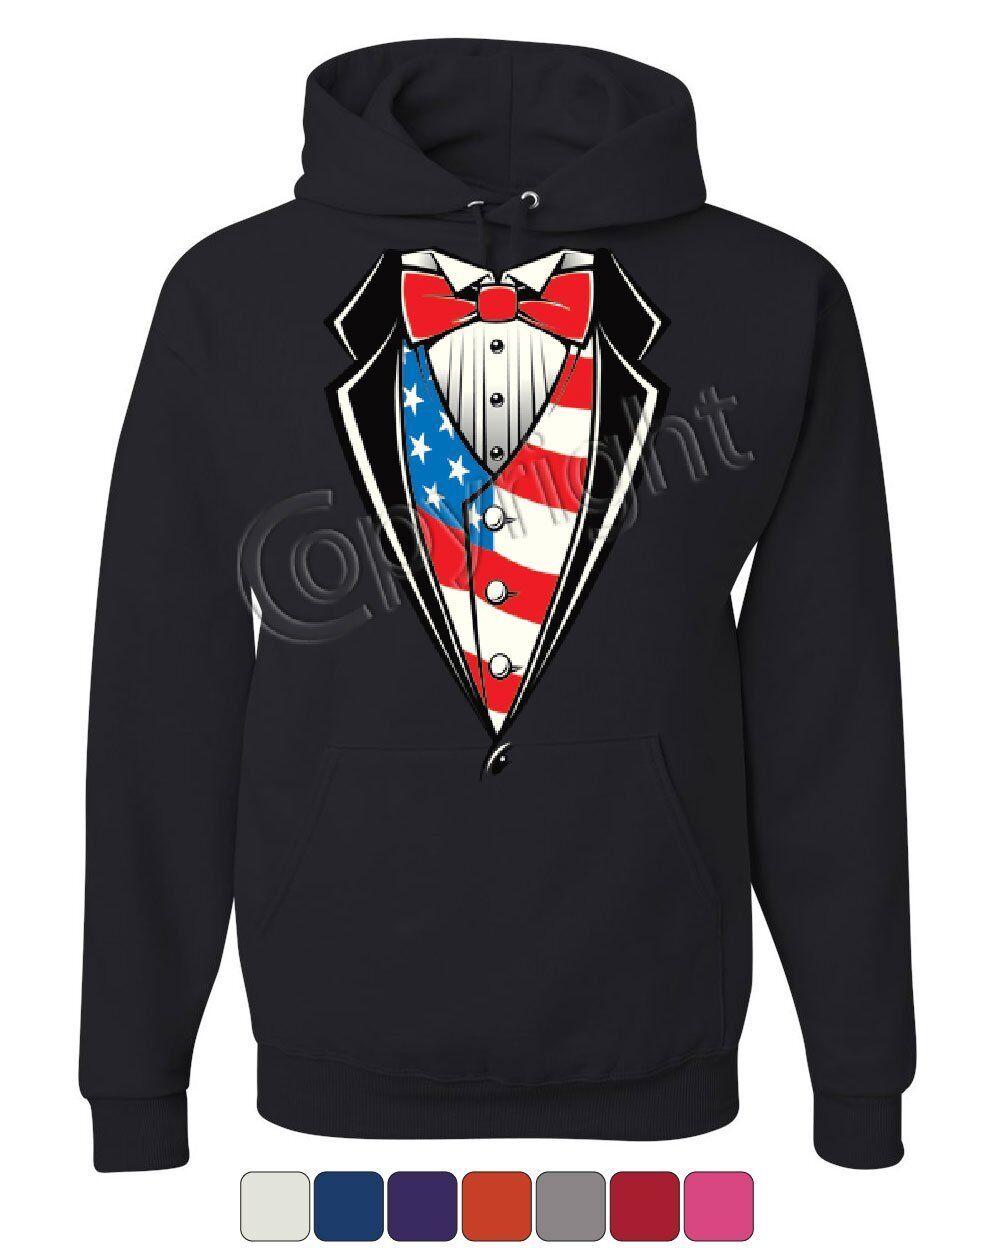 American Flag Tuxedo Hoodie Funny 4th of July Stars and Stripes Sweatshirt